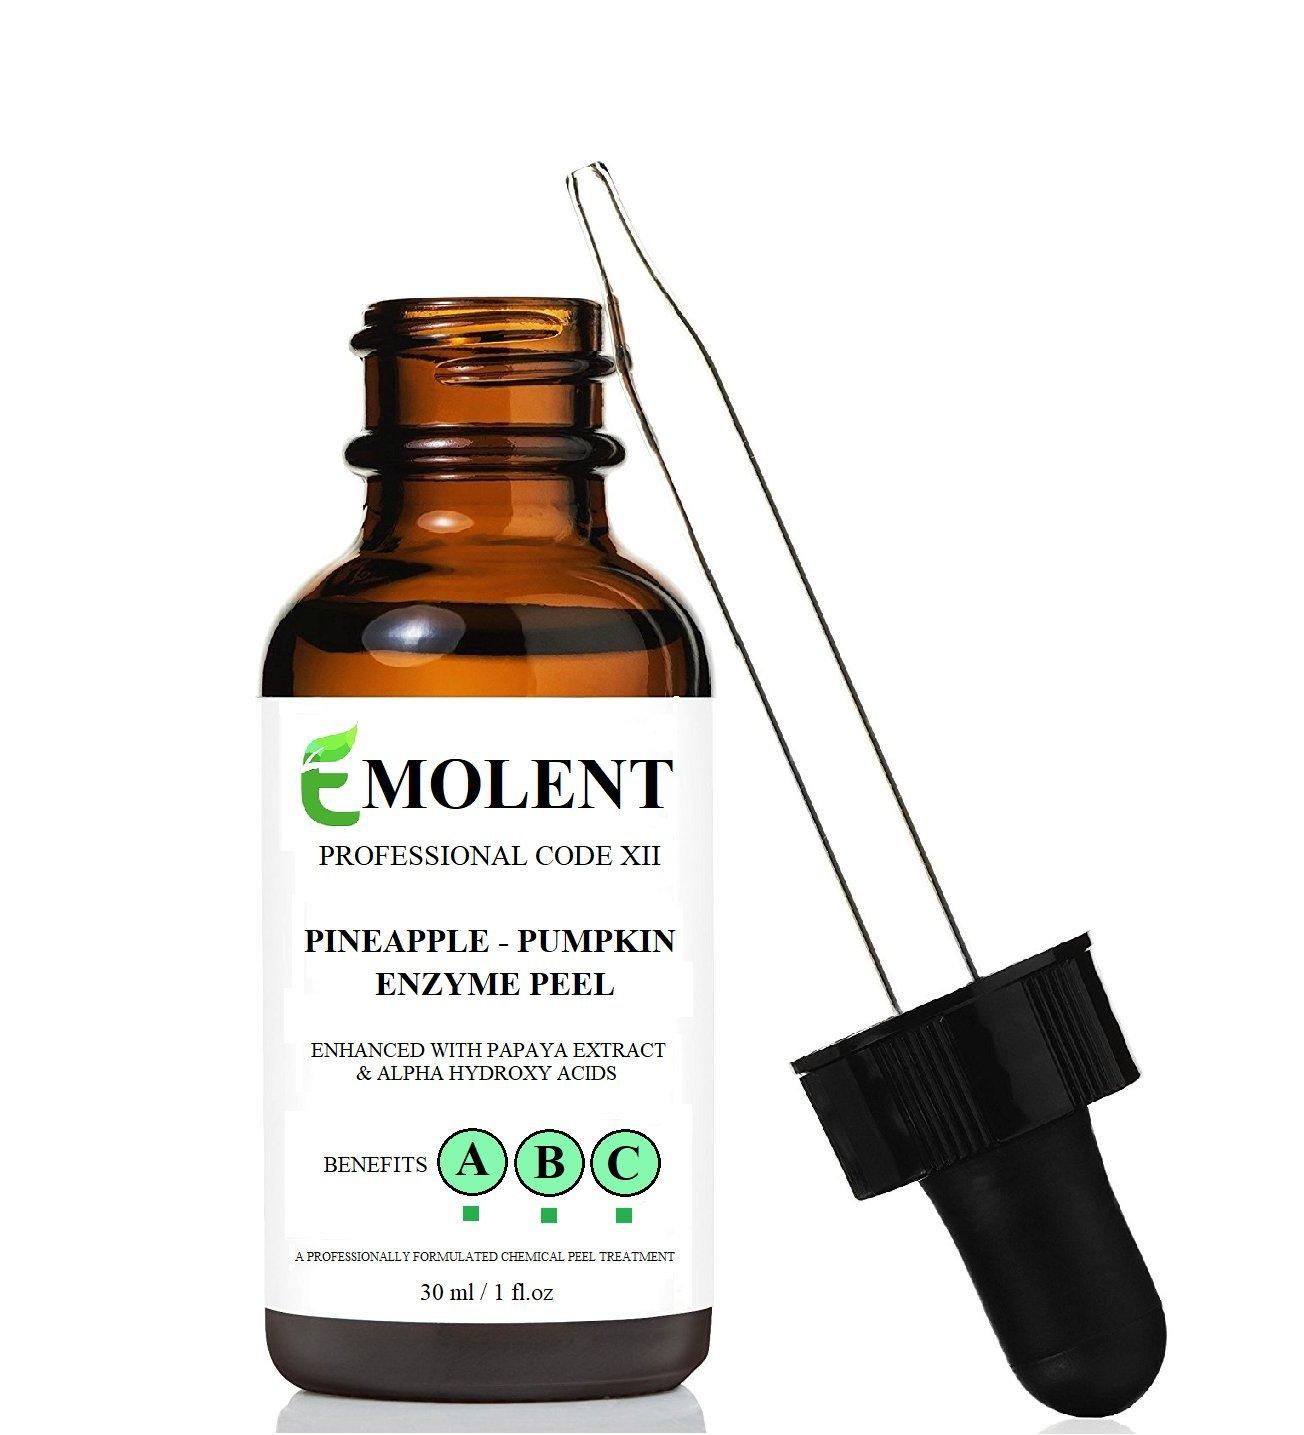 EMOLENT, Pineapple Pumpkin Enzyme Professional Skin Peel, Enhanced with Papaya Extract & Alpha Hydroxy Acids, 1 Fl.oz / 30 ml